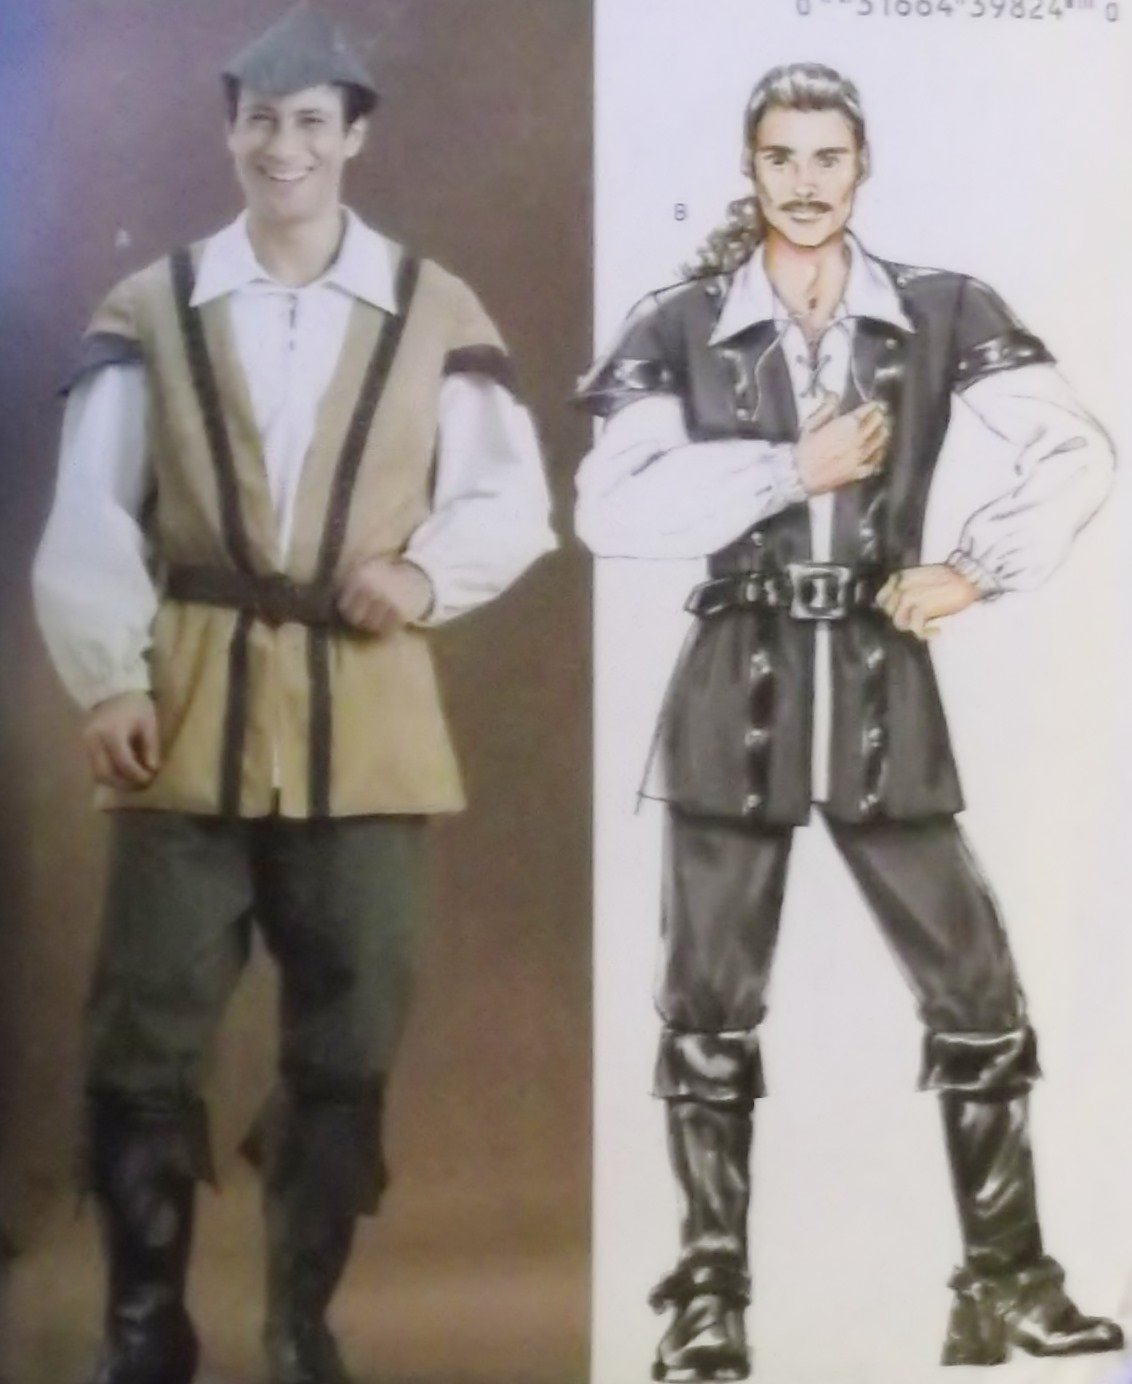 Butterick B4574 Mens Robin Hood, Pirate Costume Pattern, Size XN Xlg Xxl Xxxl, Uncut